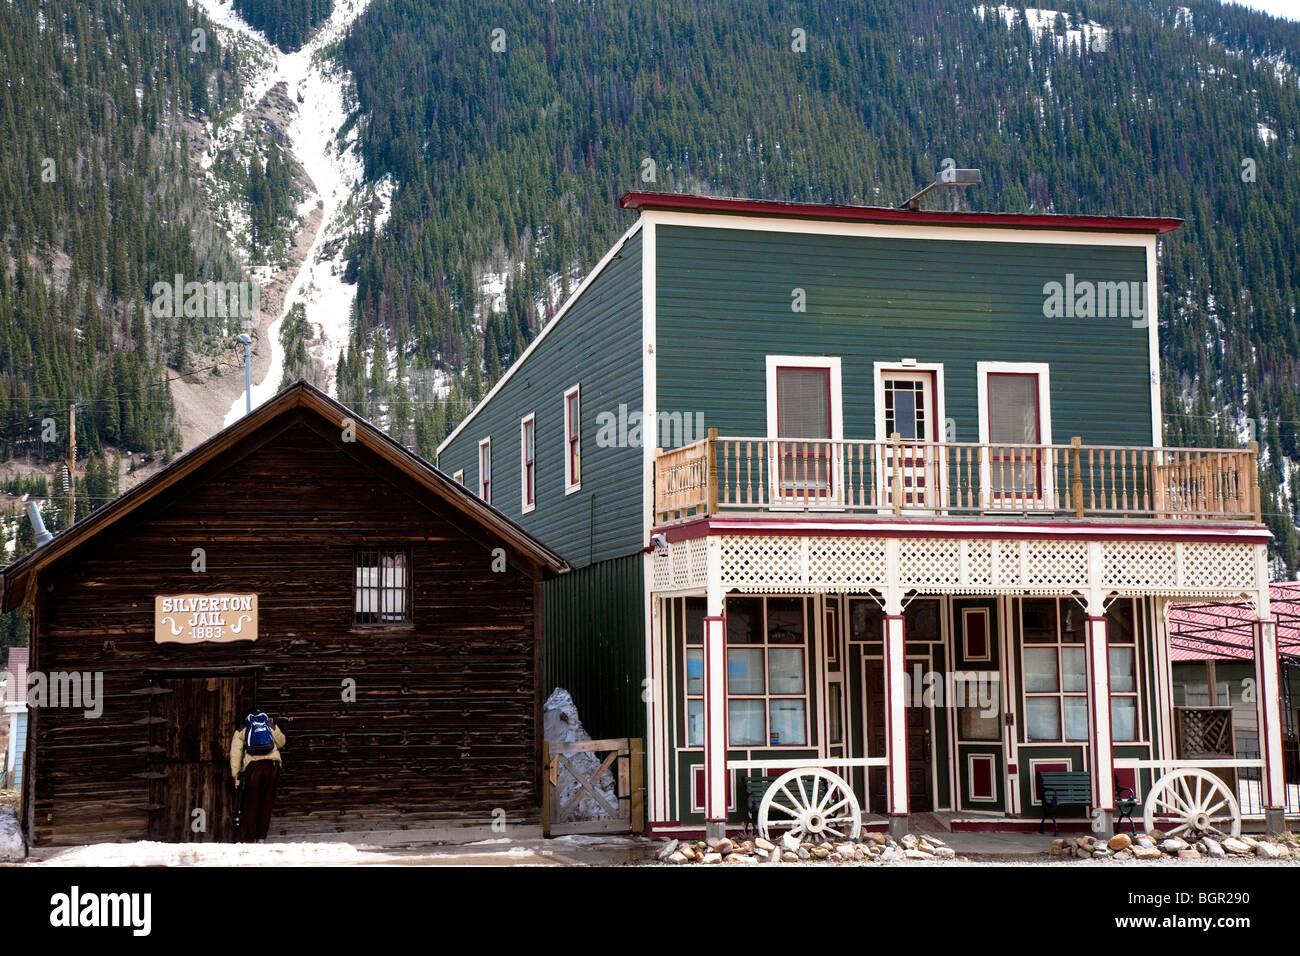 Old San Juan County Jail house Silverton, old west mining town, San Juan County Colorado, USA - Stock Image